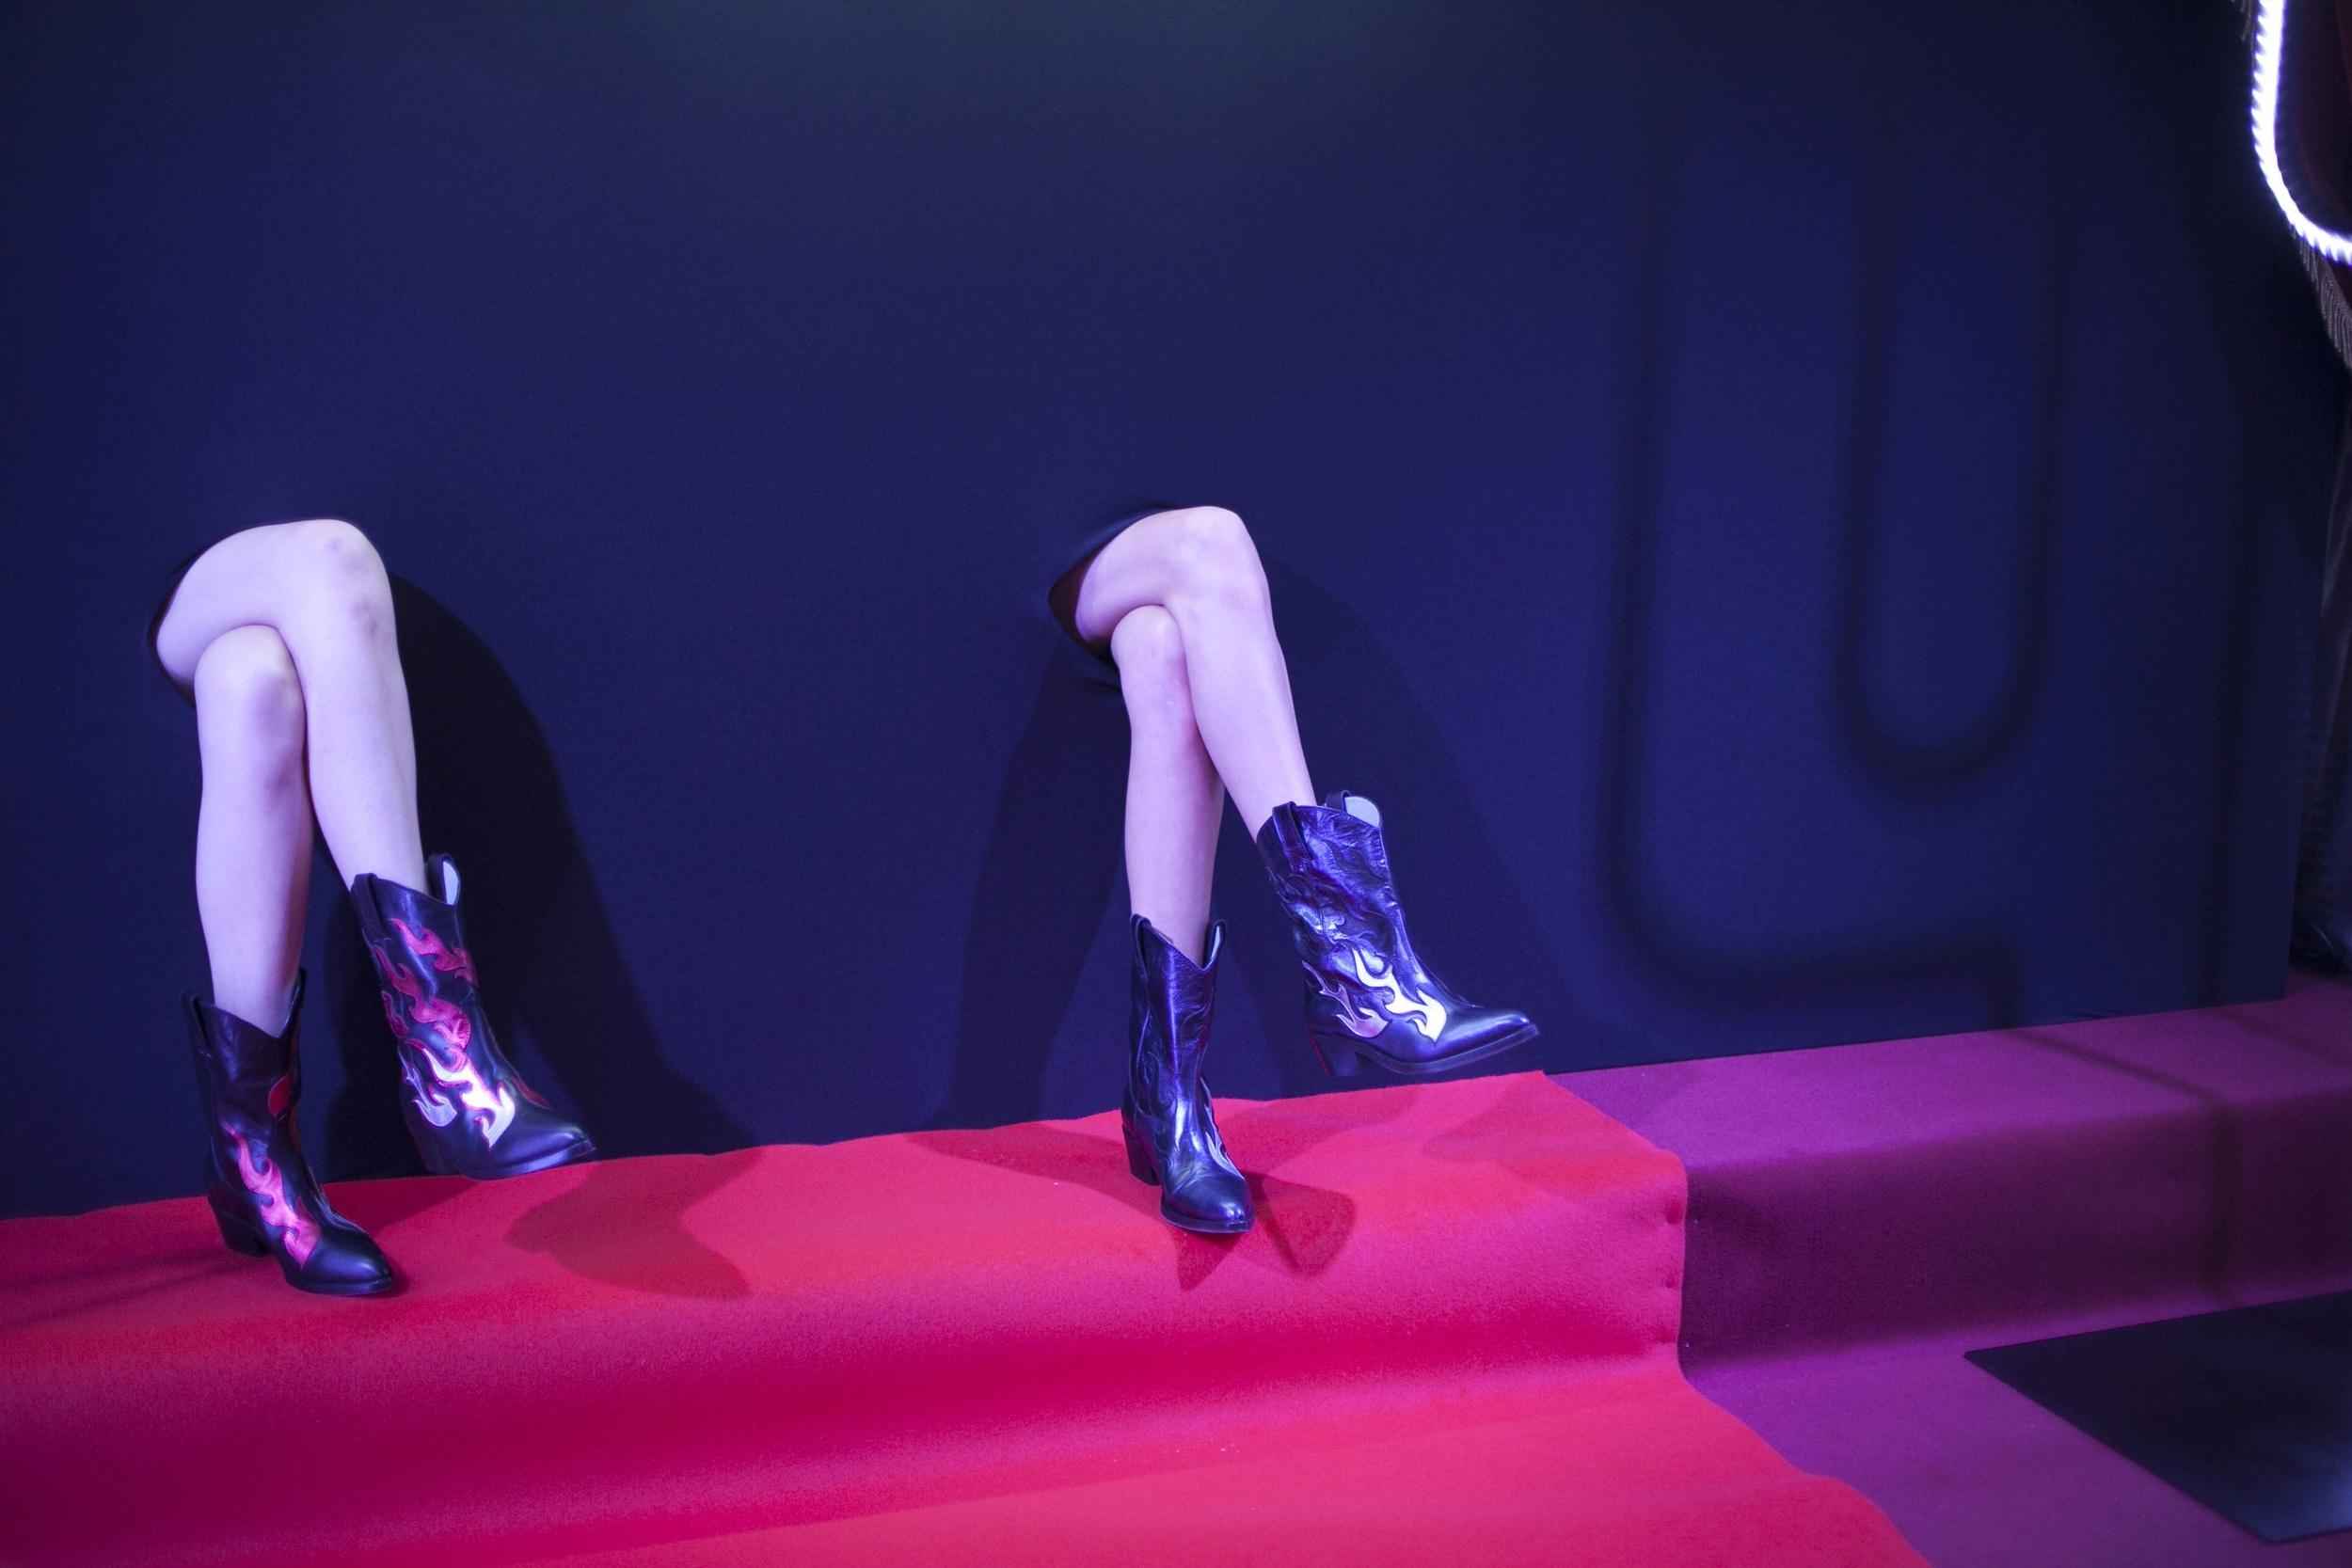 Camperos boot - Chiara Ferragni